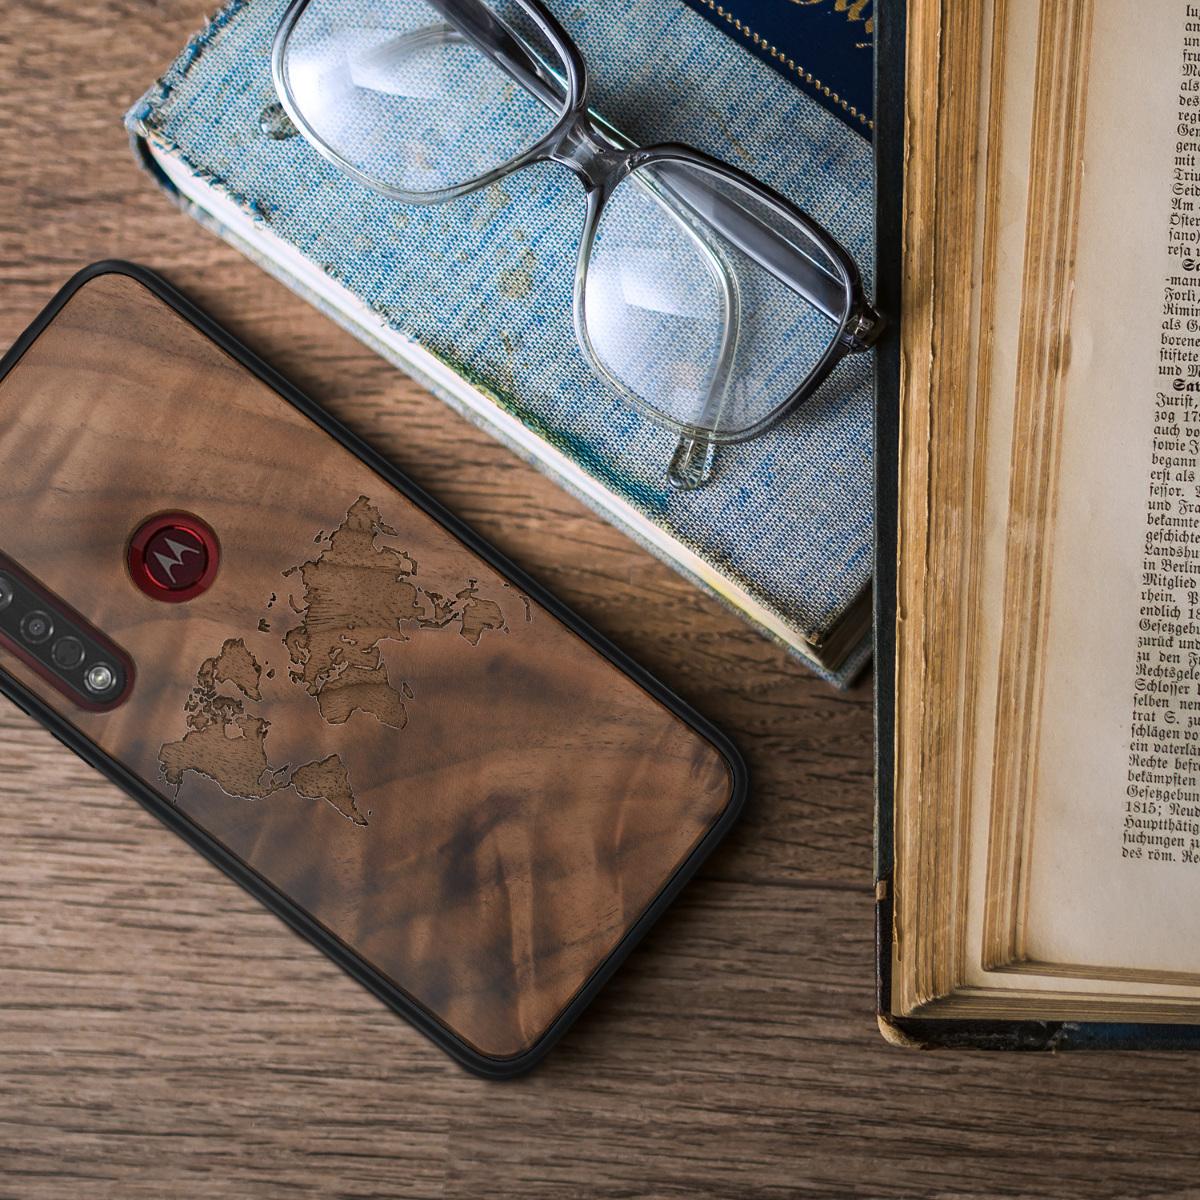 Recensione: cover in legno WoodMi Compound per iPhone TheAppleLounge